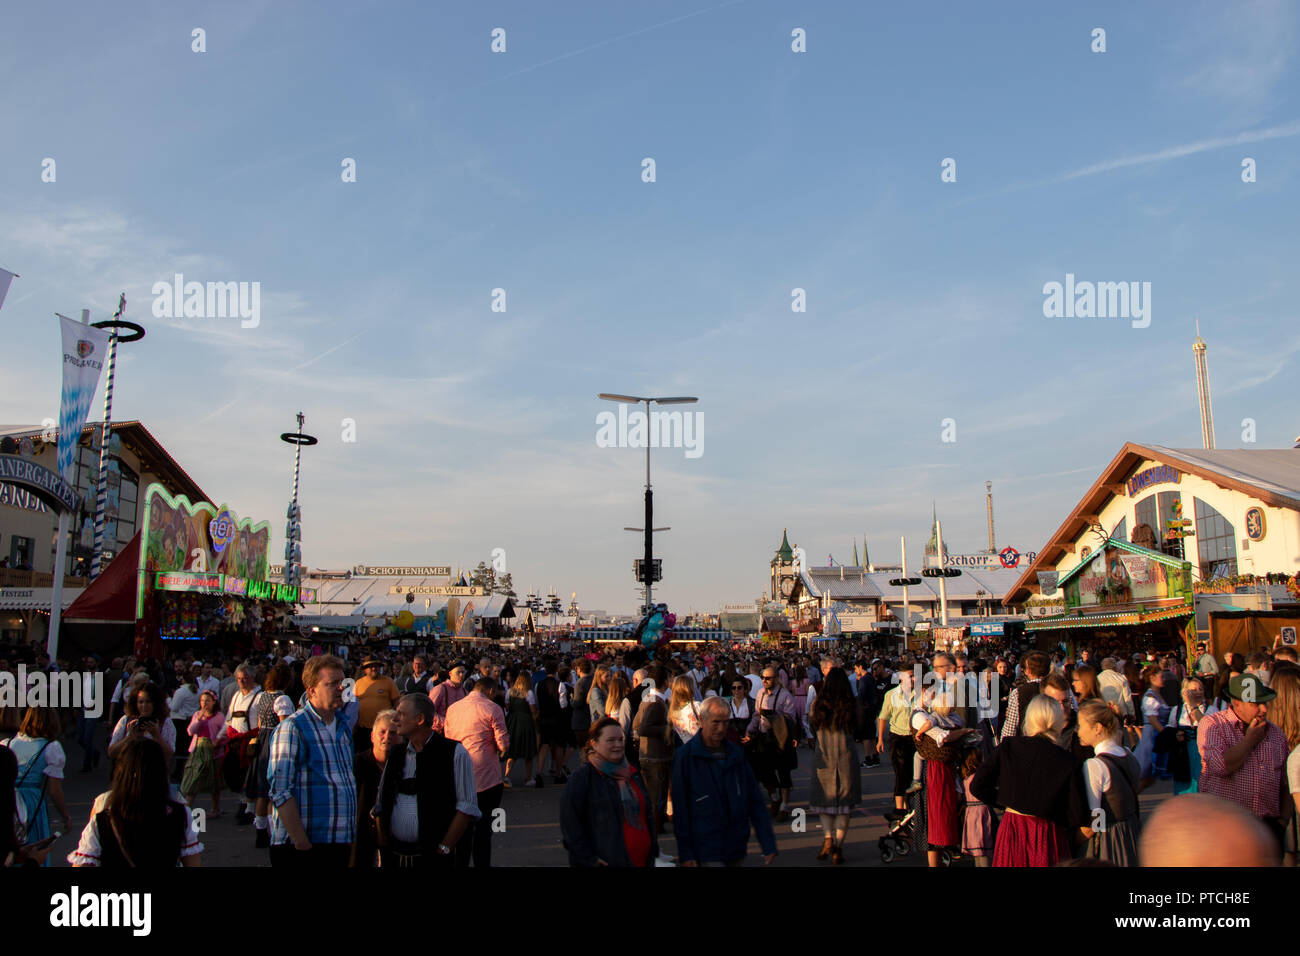 People at the Oktoberfest, wiesn, 2018, - Stock Image